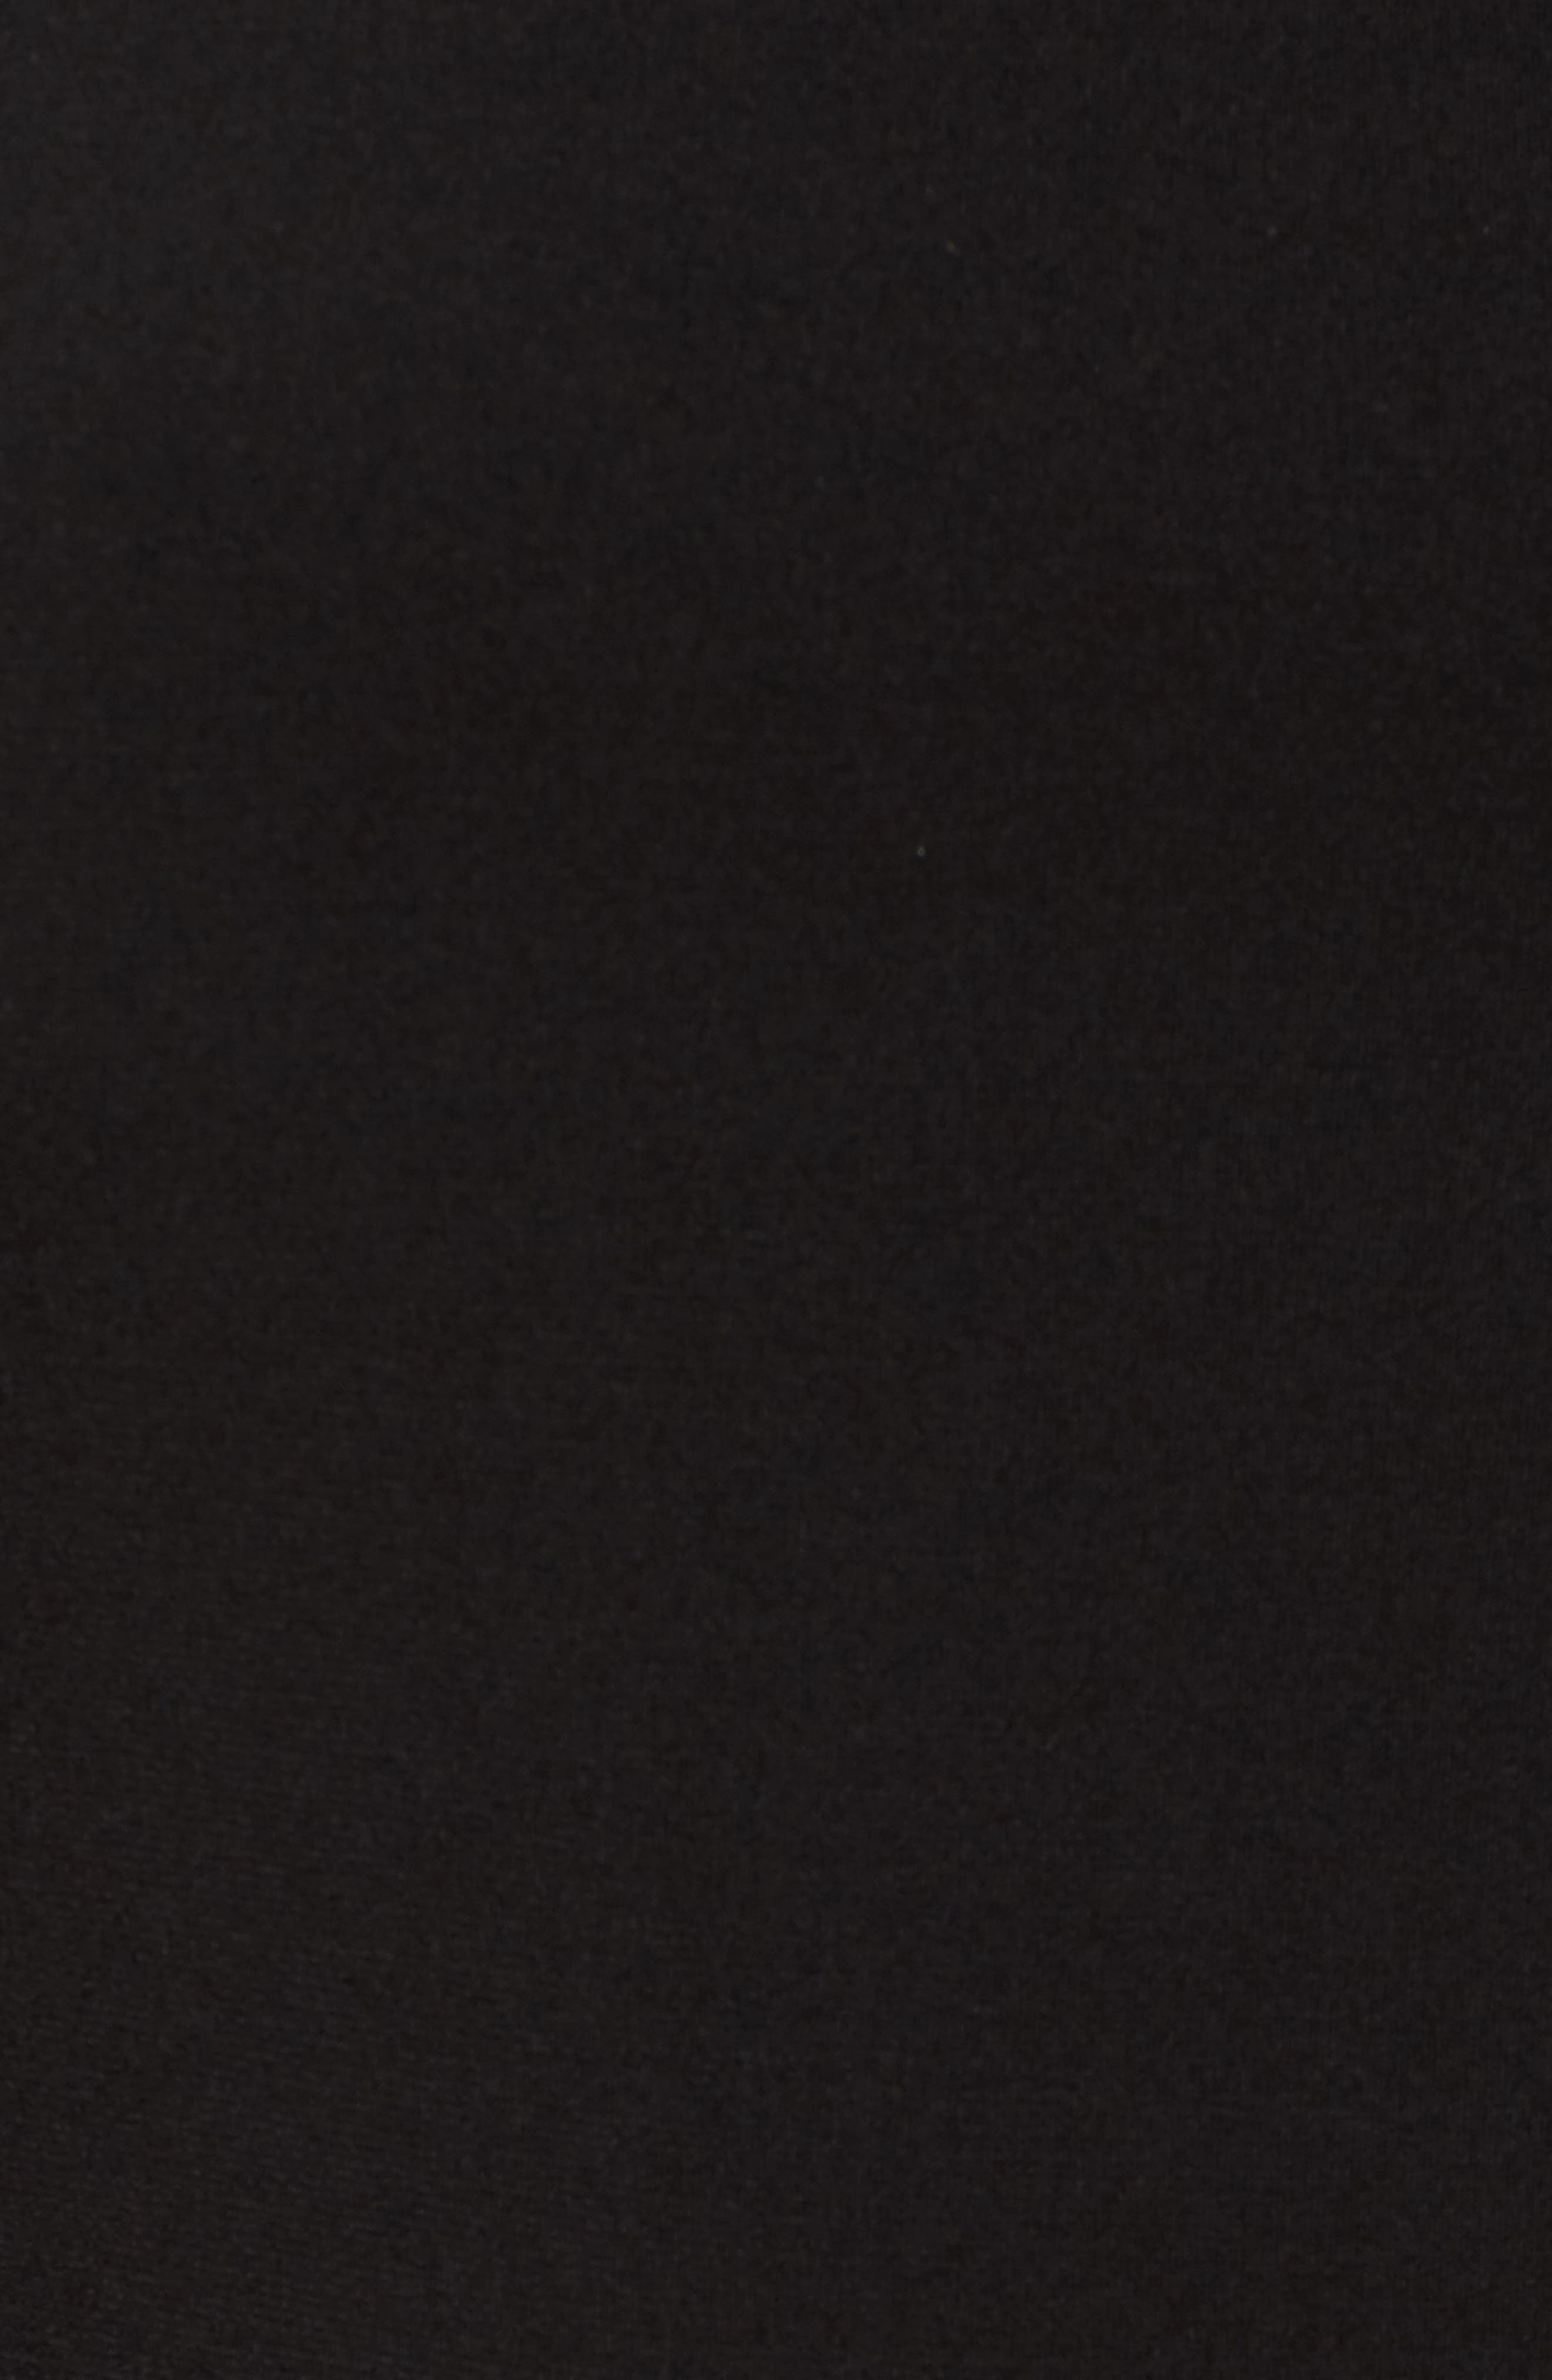 Grommet Mock Neck Knit Dress,                             Alternate thumbnail 5, color,                             Black